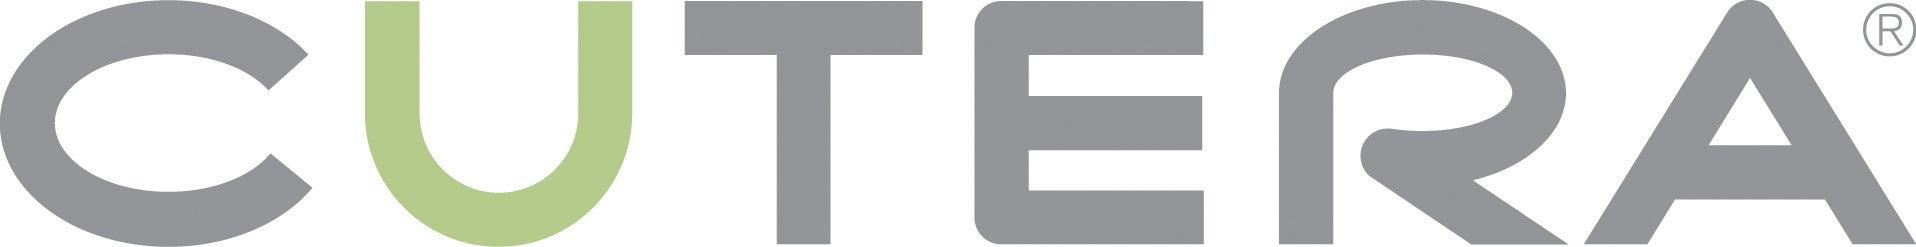 CUTR logo